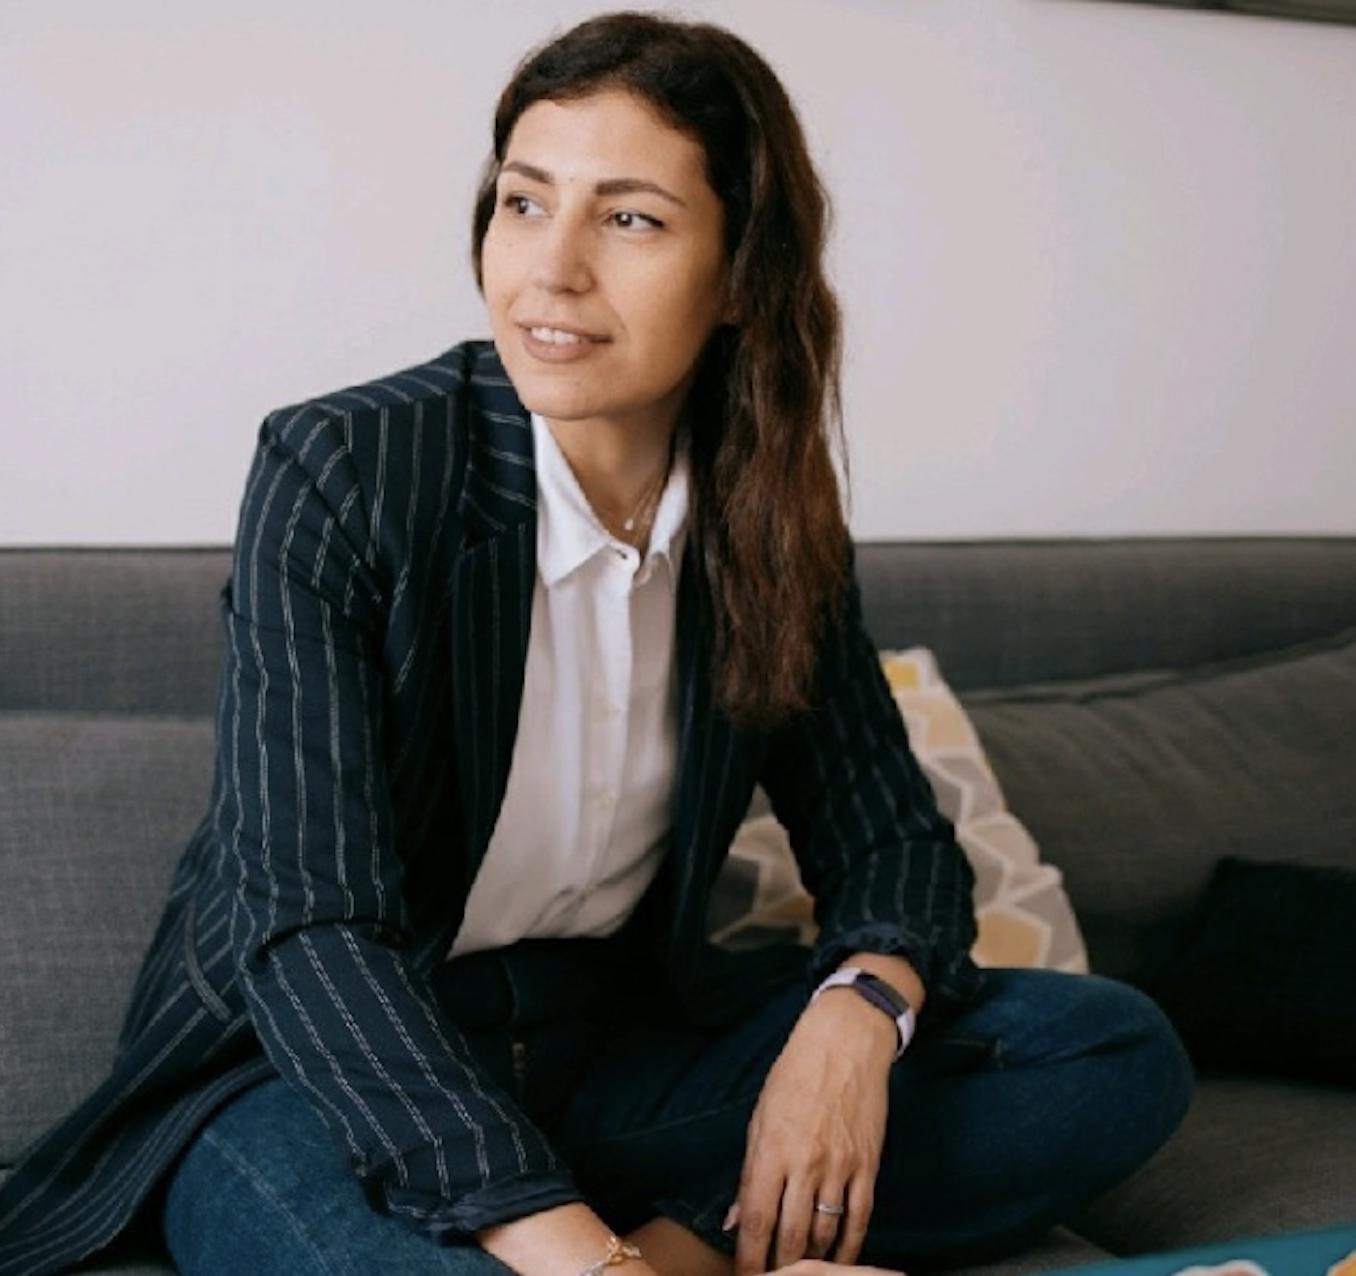 Chiara Randazzo